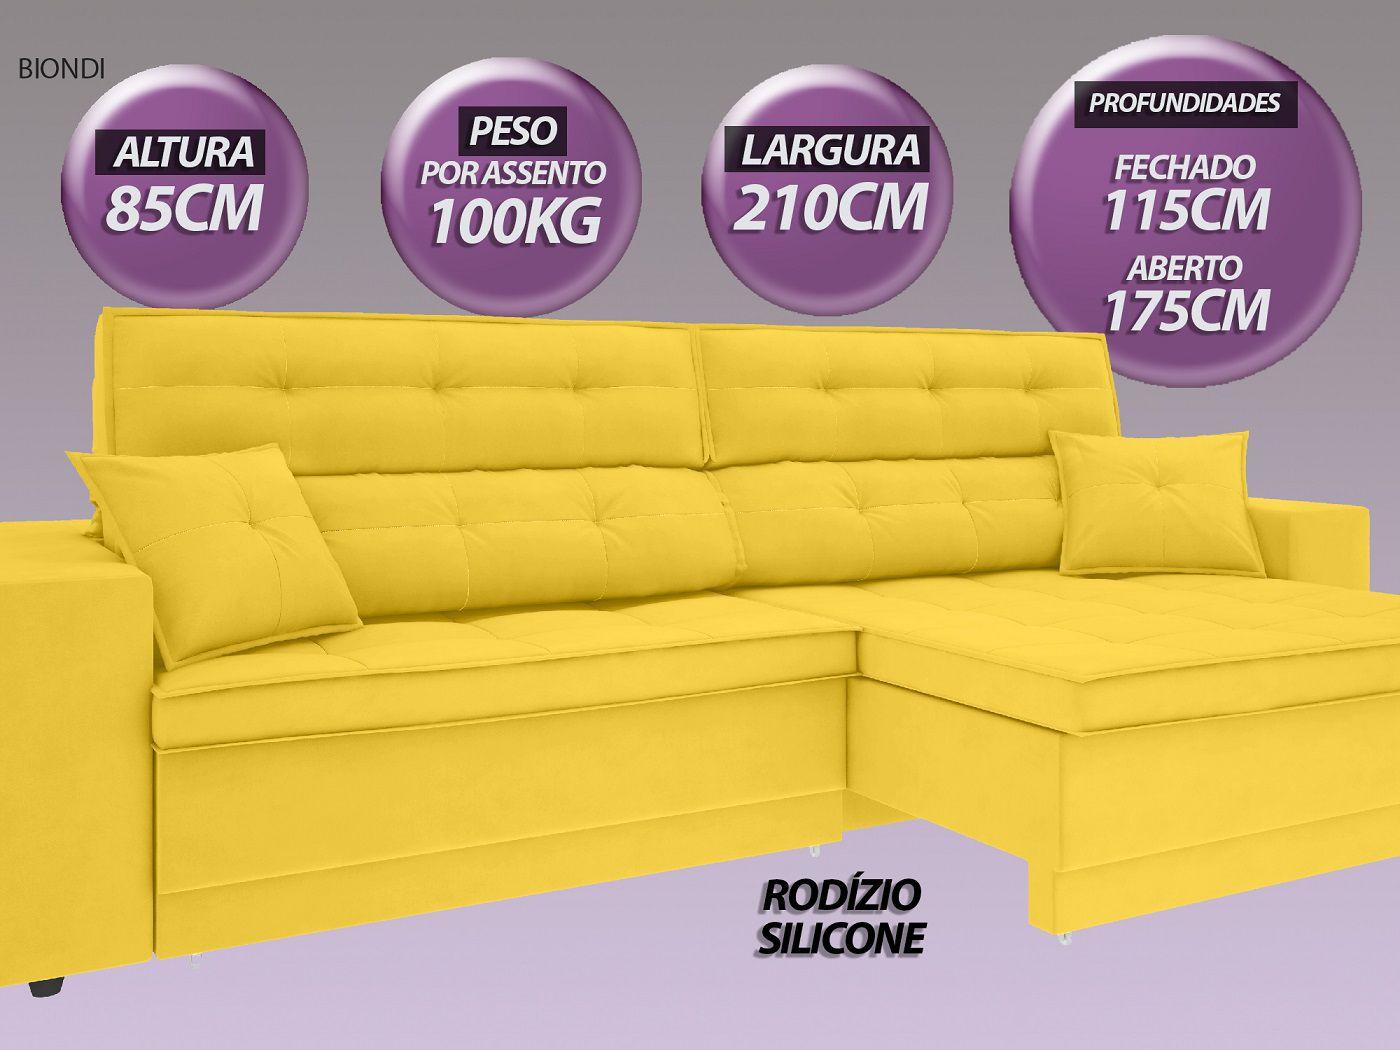 Sofá New Biondi 2,10m Retrátil e Reclinável Velosuede Canario  - NETSOFAS